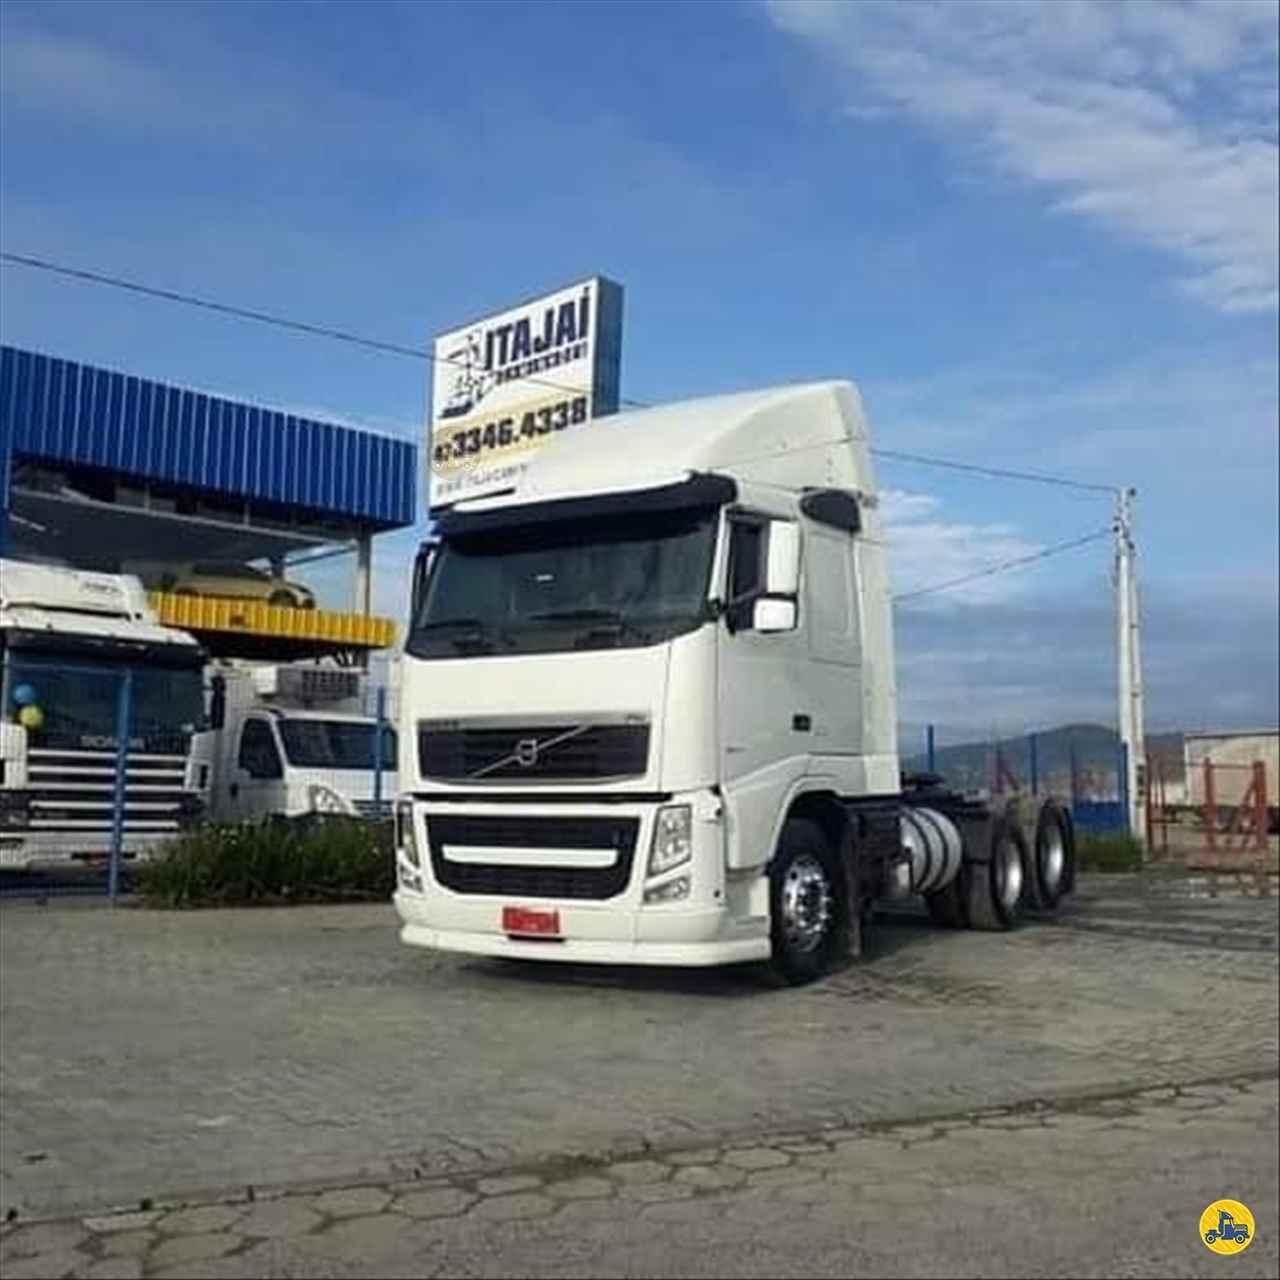 CAMINHAO VOLVO VOLVO FH 400 Cavalo Mecânico Truck 6x2 Itajai Caminhões NAVEGANTES SANTA CATARINA SC